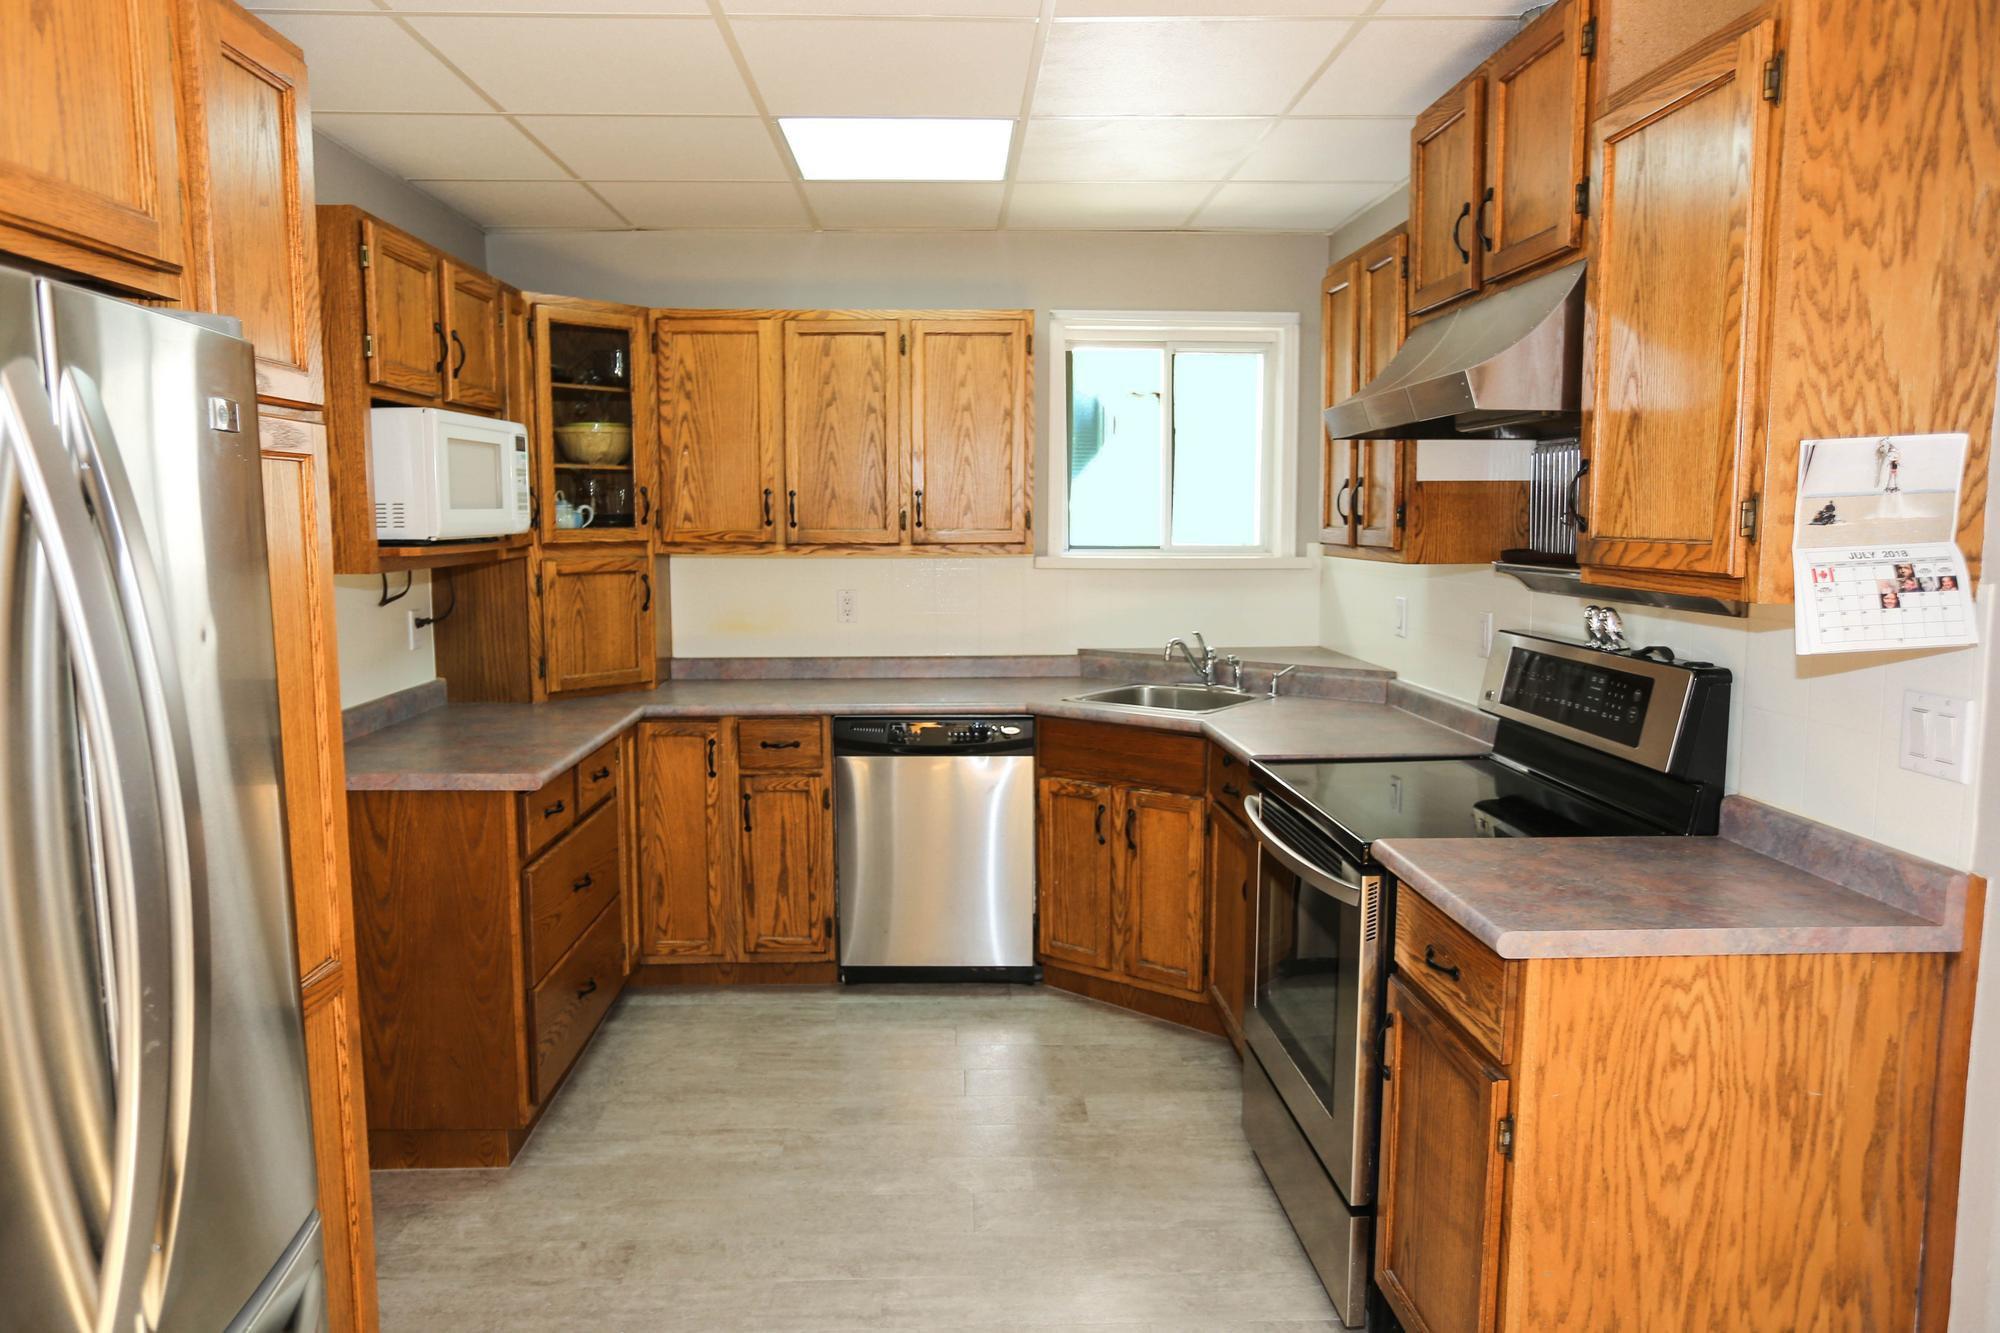 Photo 15: Photos: 105 Evanson Street in Winnipeg: Wolseley Single Family Detached for sale (5B)  : MLS®# 1821900